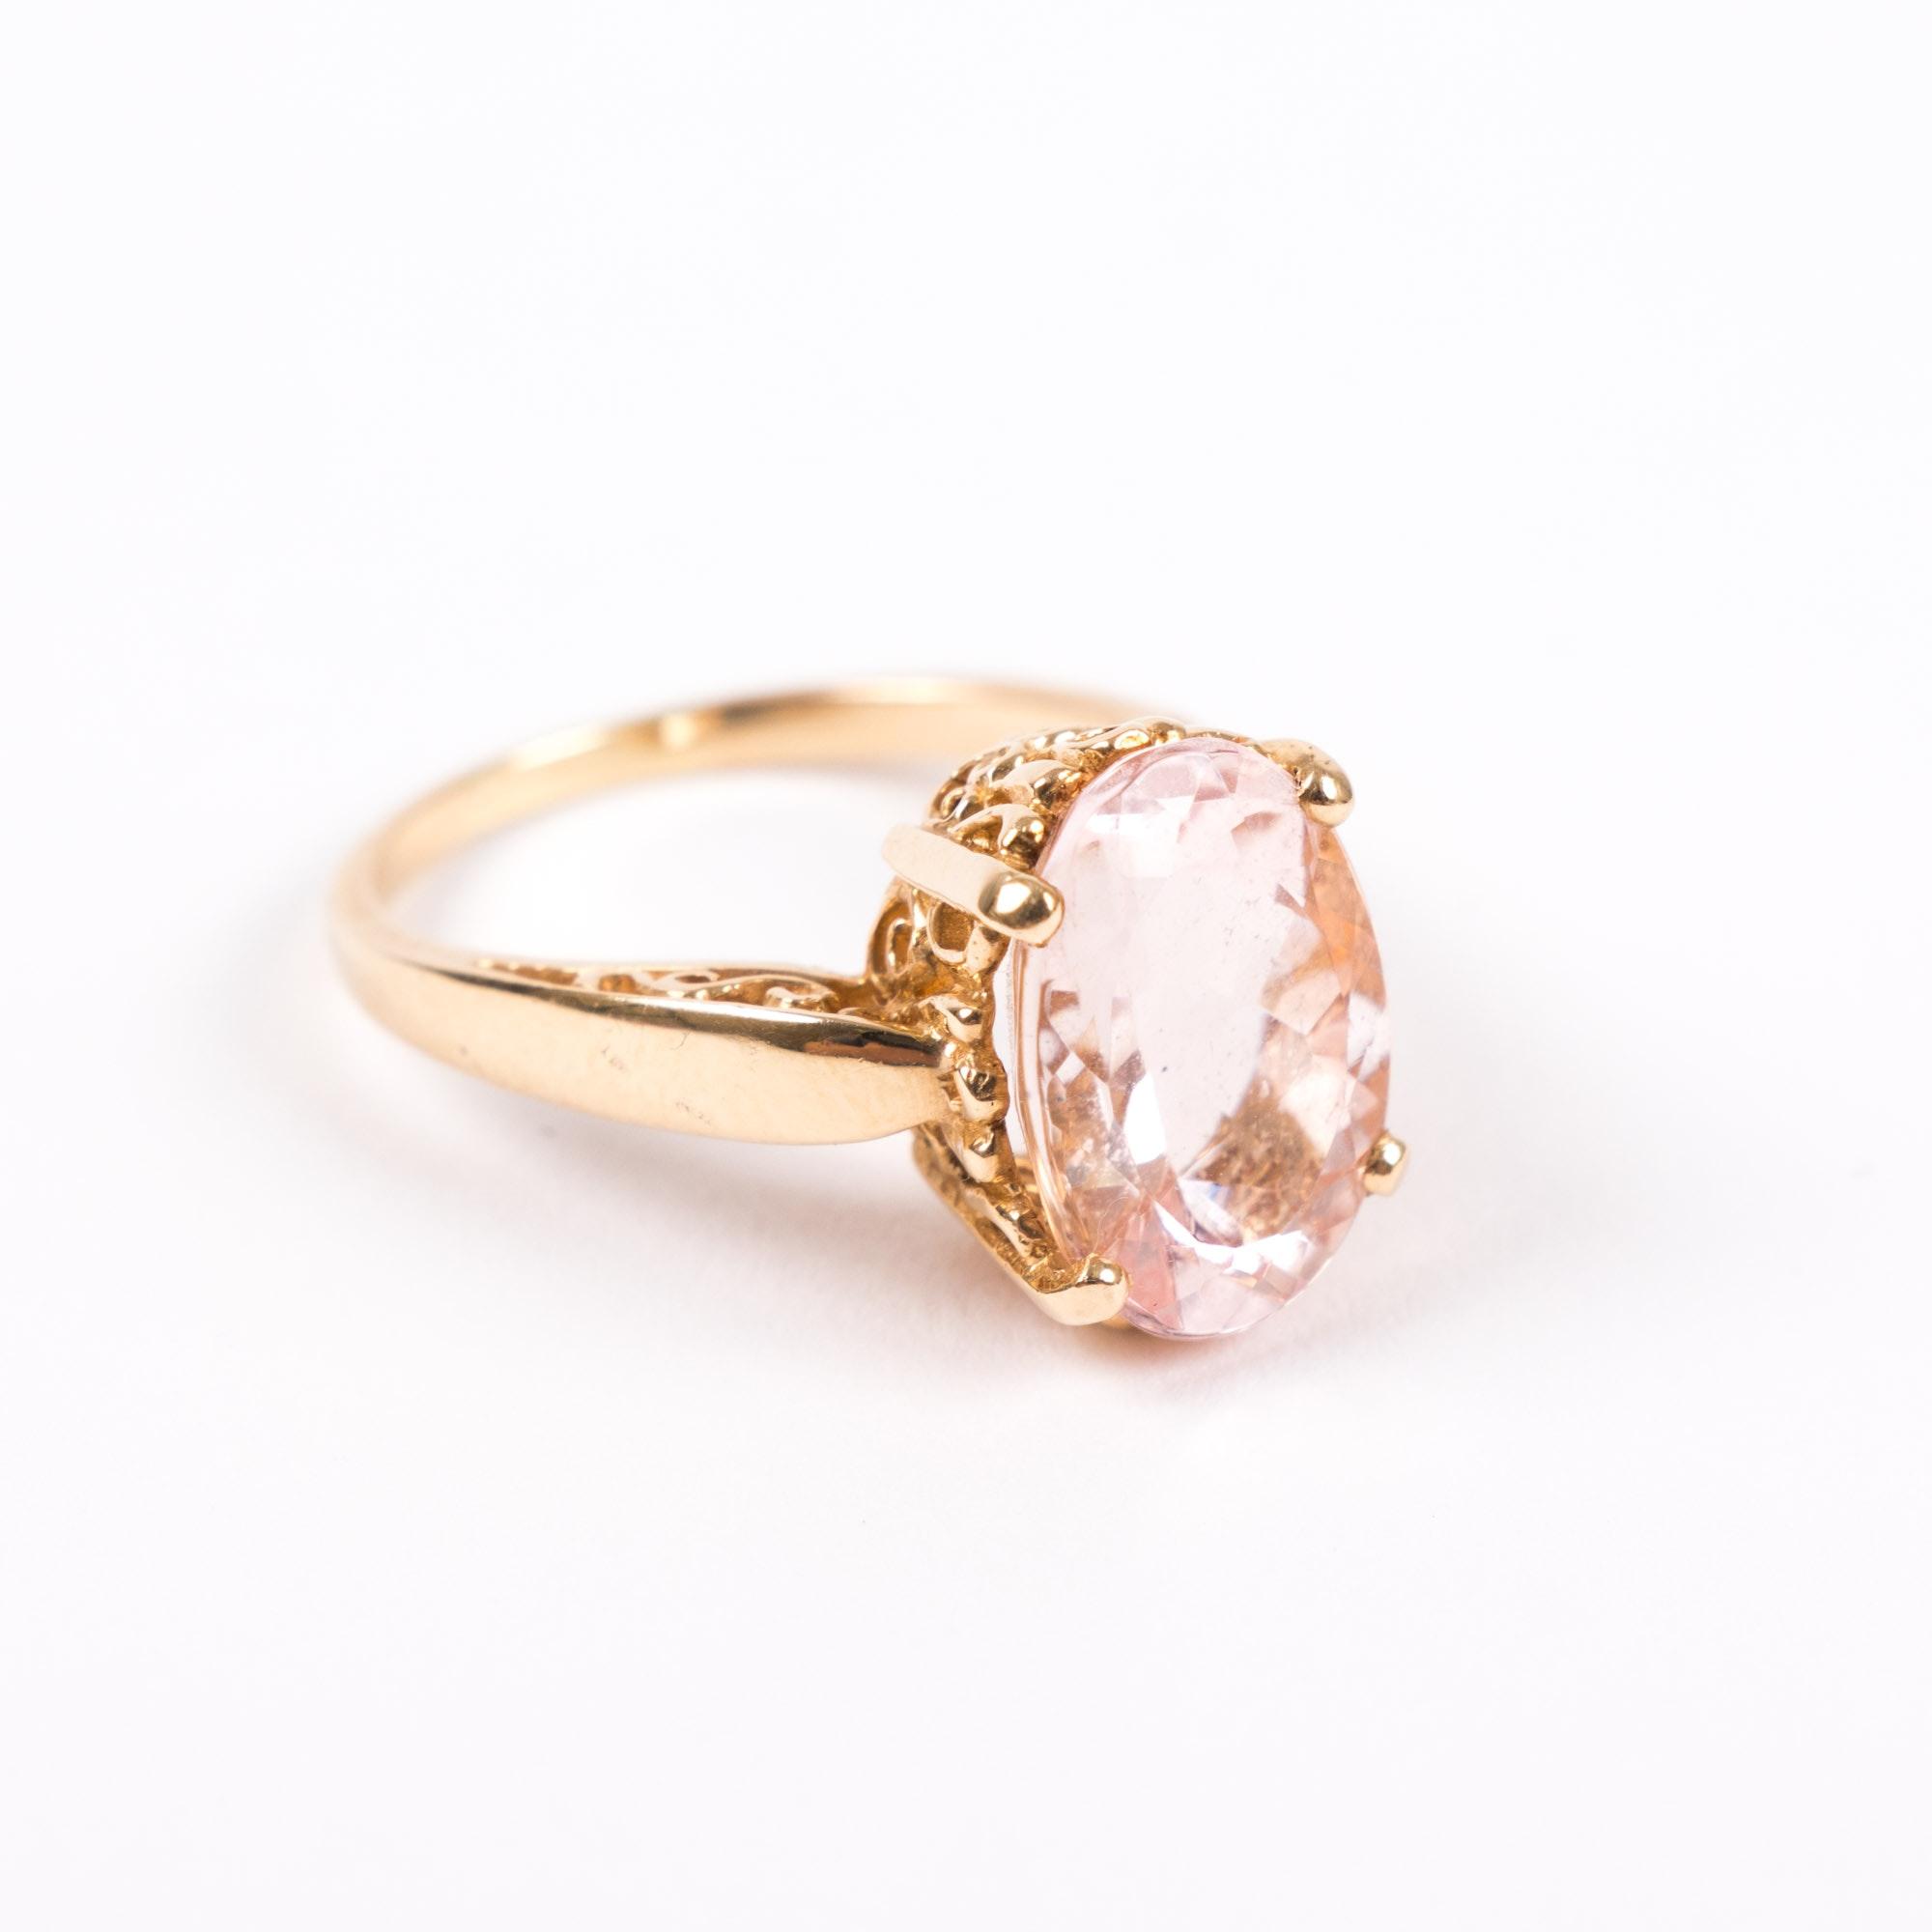 14K Yellow Gold and 5.38 CT Morganite Ring